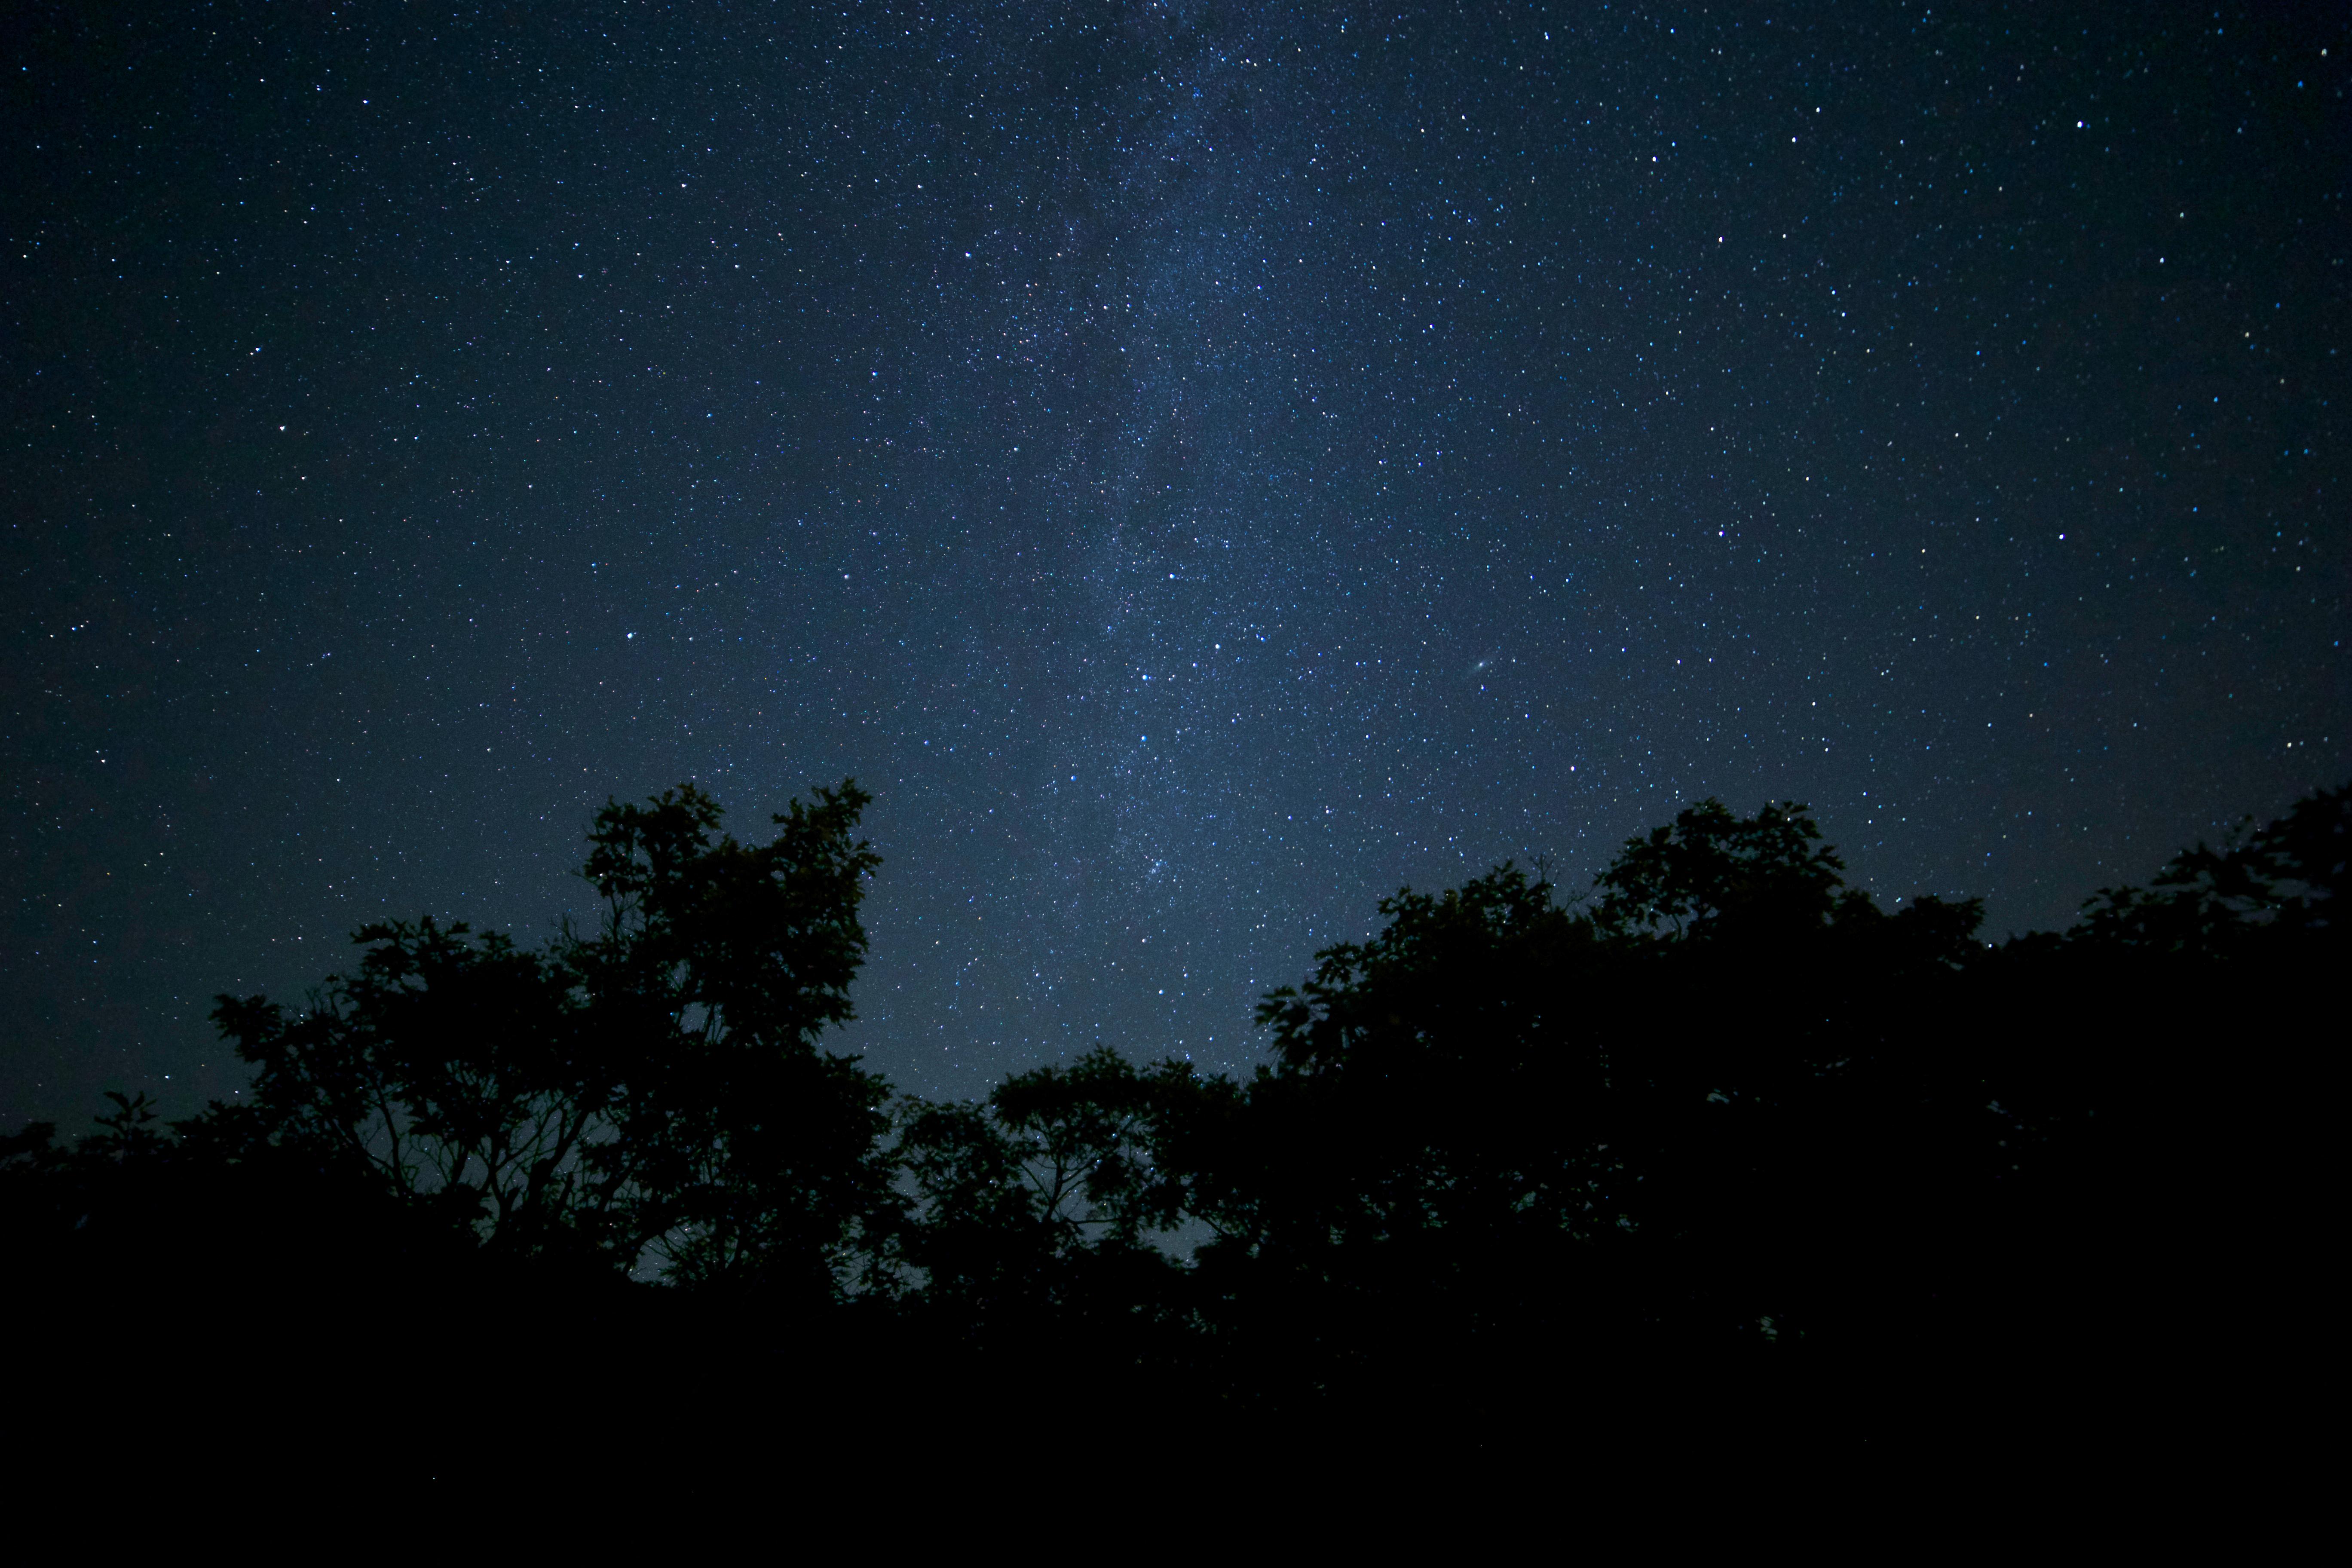 Respirar (Enril) - Relato Night-trees-milky-way-stars